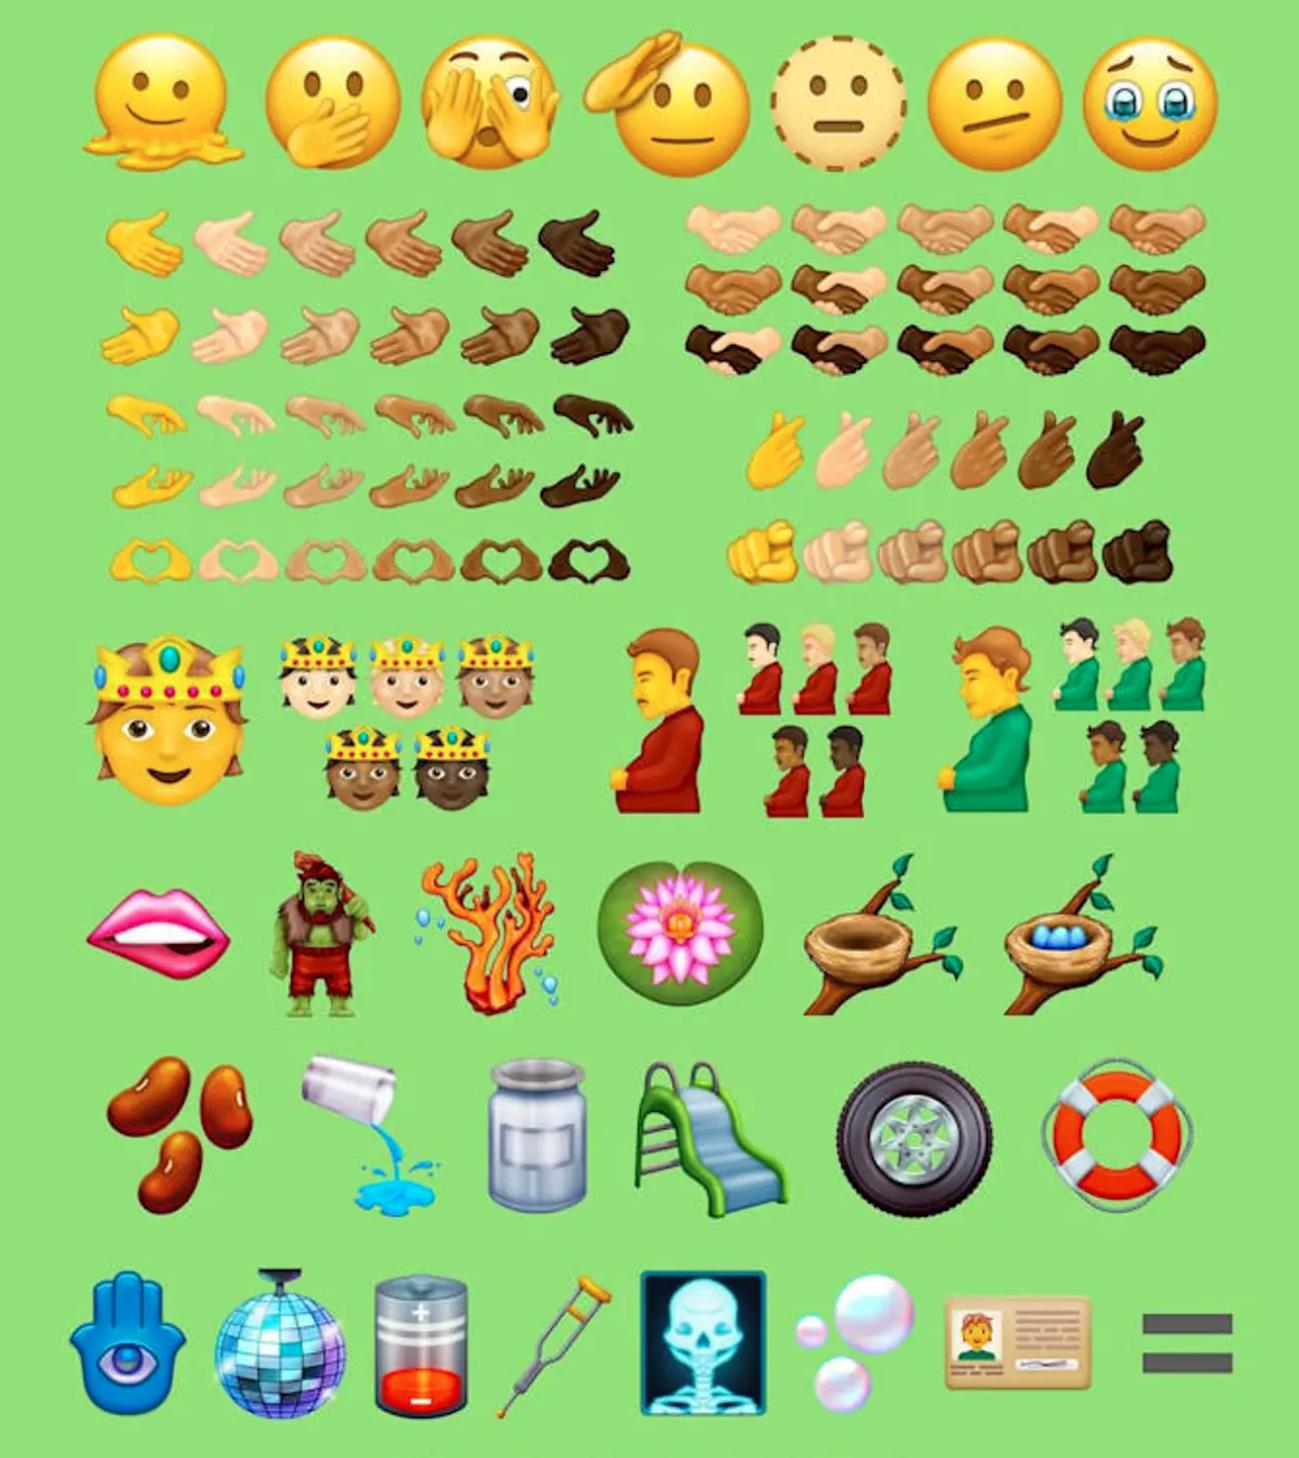 Pregnant man emoji confirmed for next smartphone updates, The Manc